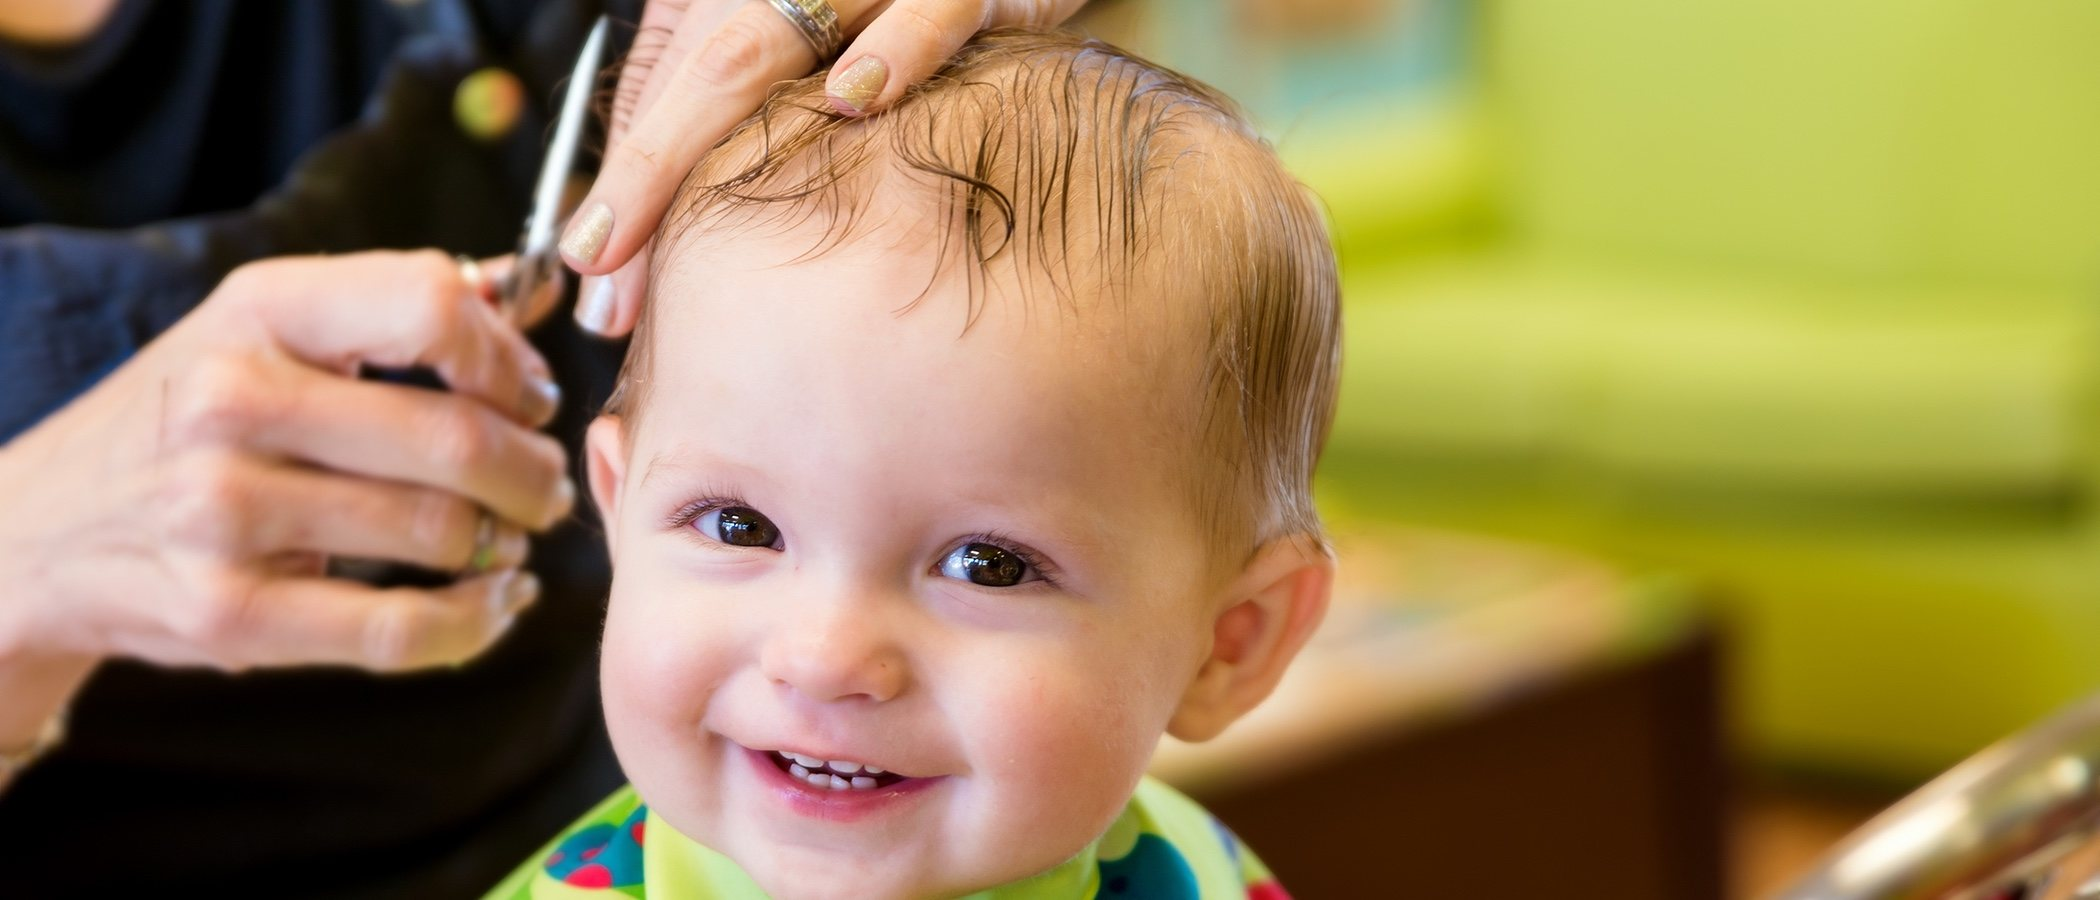 Cortes de pelo para niño